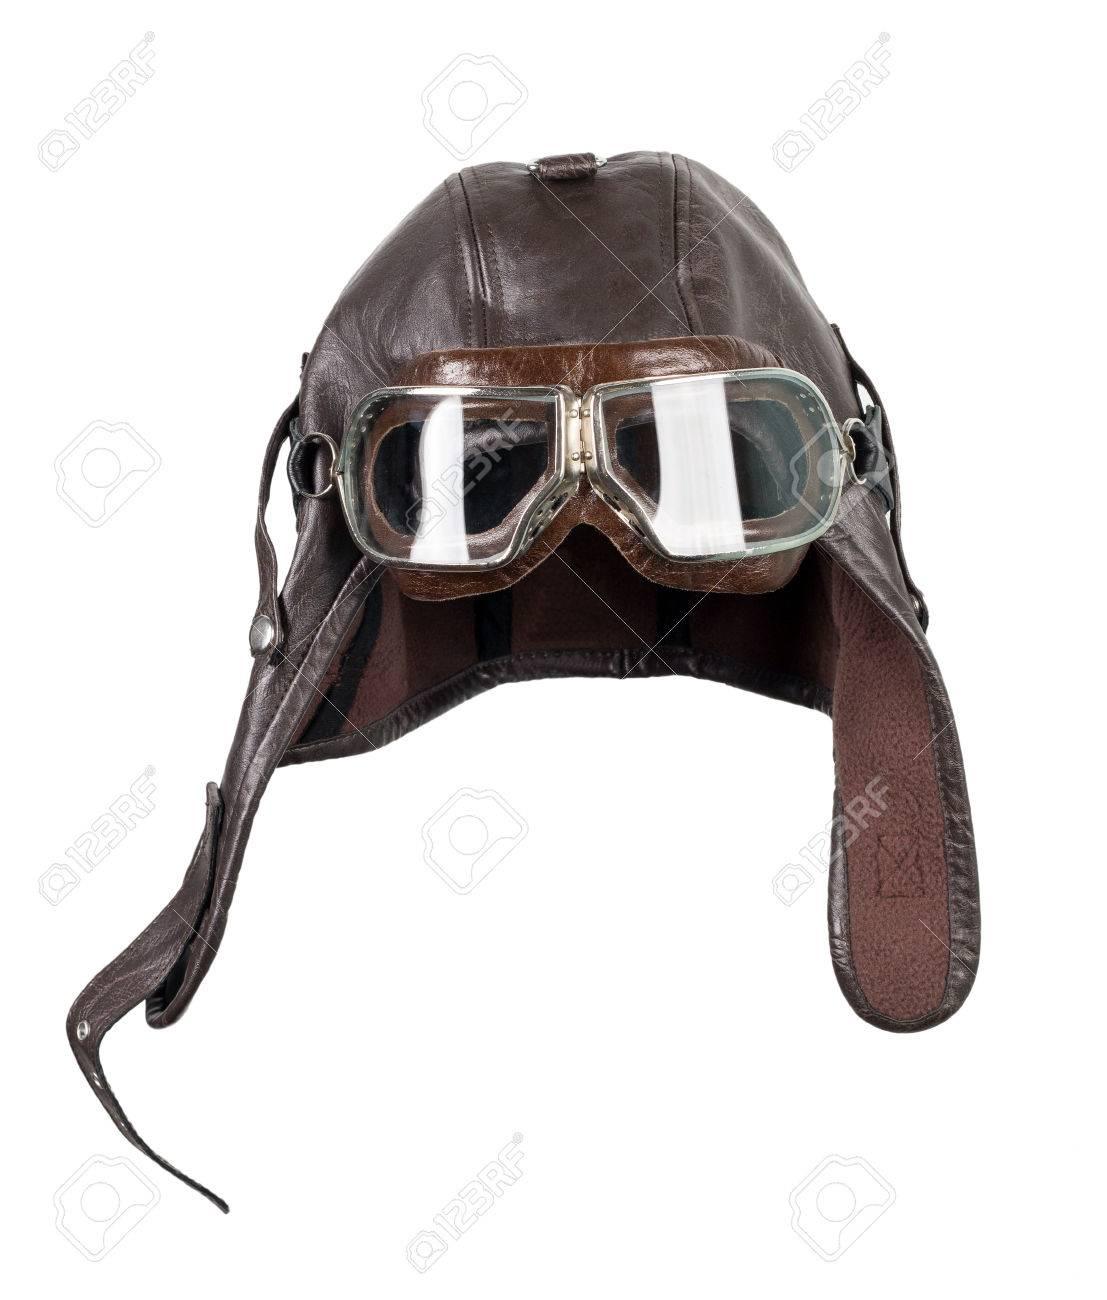 Old pilot   aviator hat Stock Photo - 74856540 427e8d0b1da